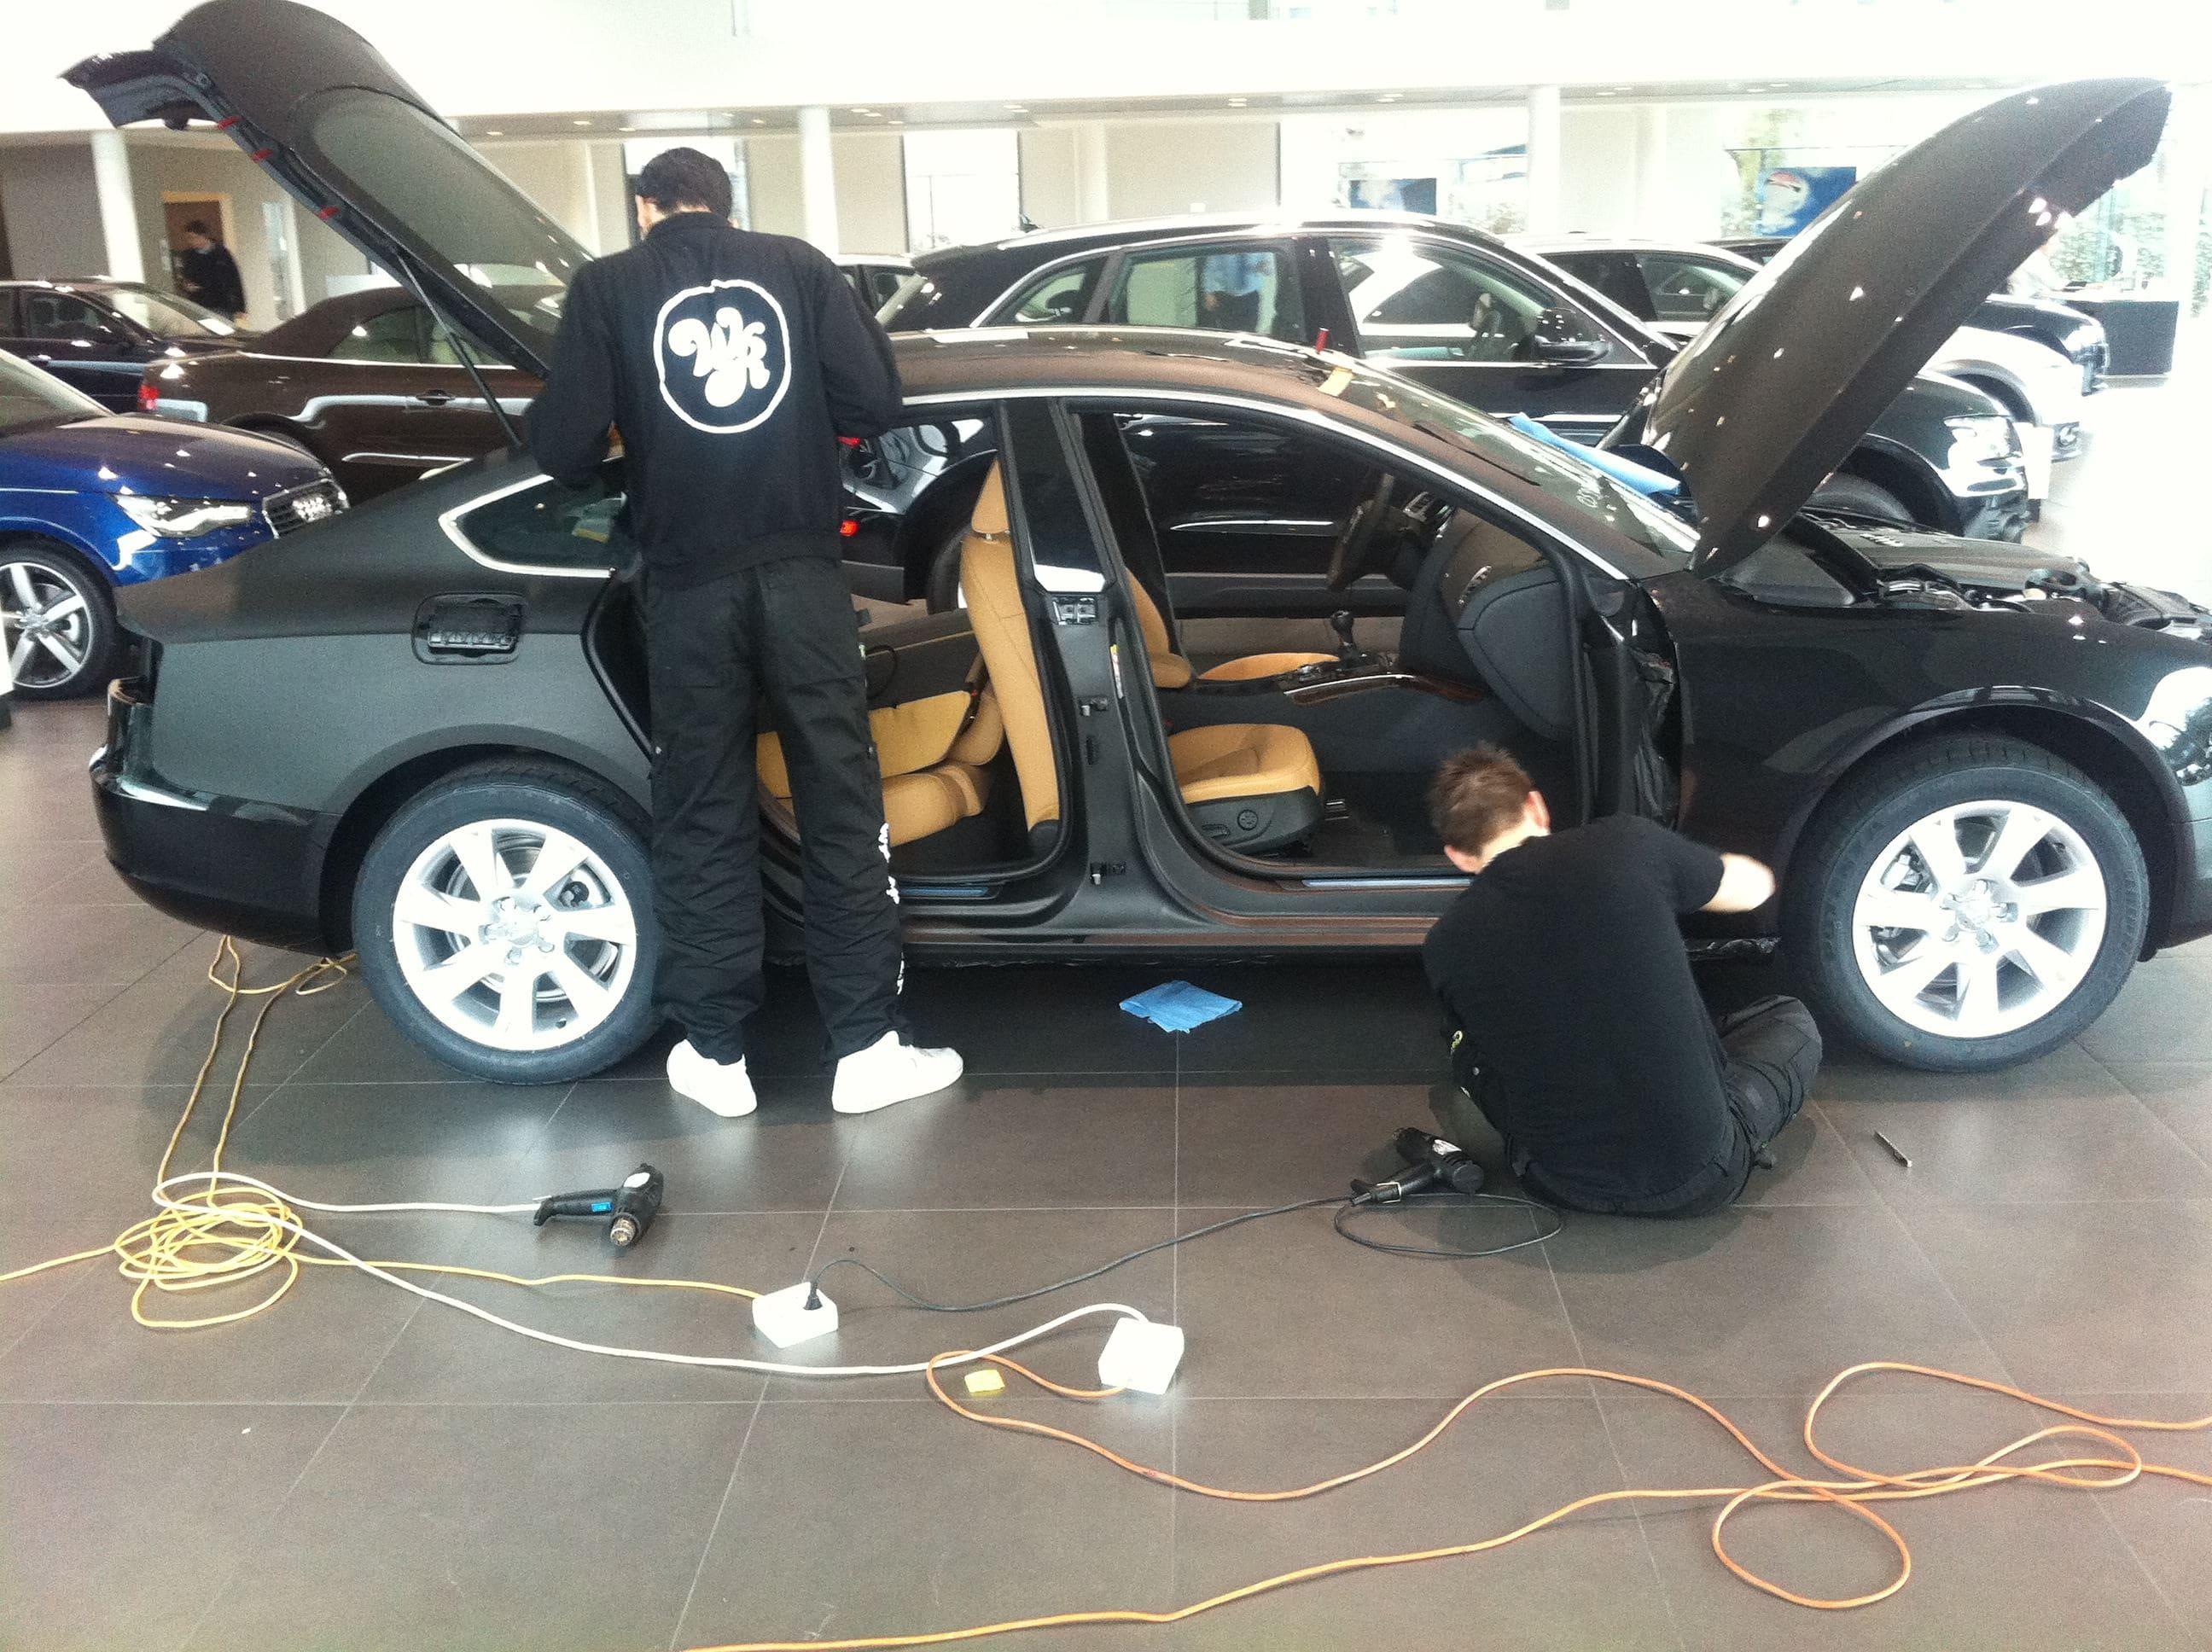 Audi A5 Sportback met Mat Grijze Wrap, Carwrapping door Wrapmyride.nu Foto-nr:4760, ©2021